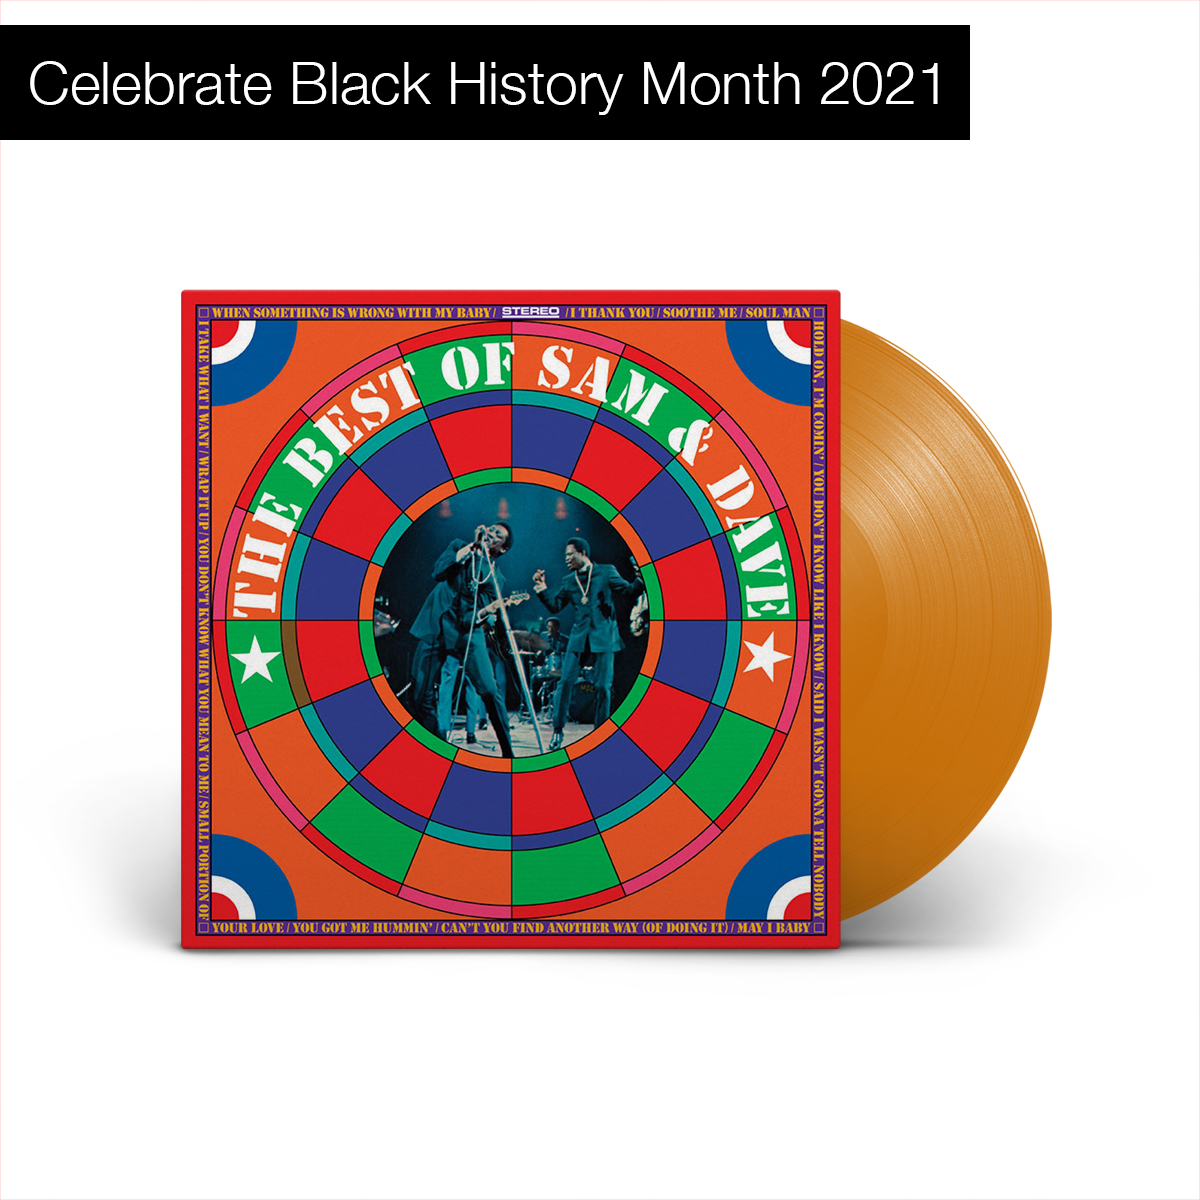 Sam & Dave - The Best Of Sam & Dave (180 Gram Translucent Gold Vinyl)